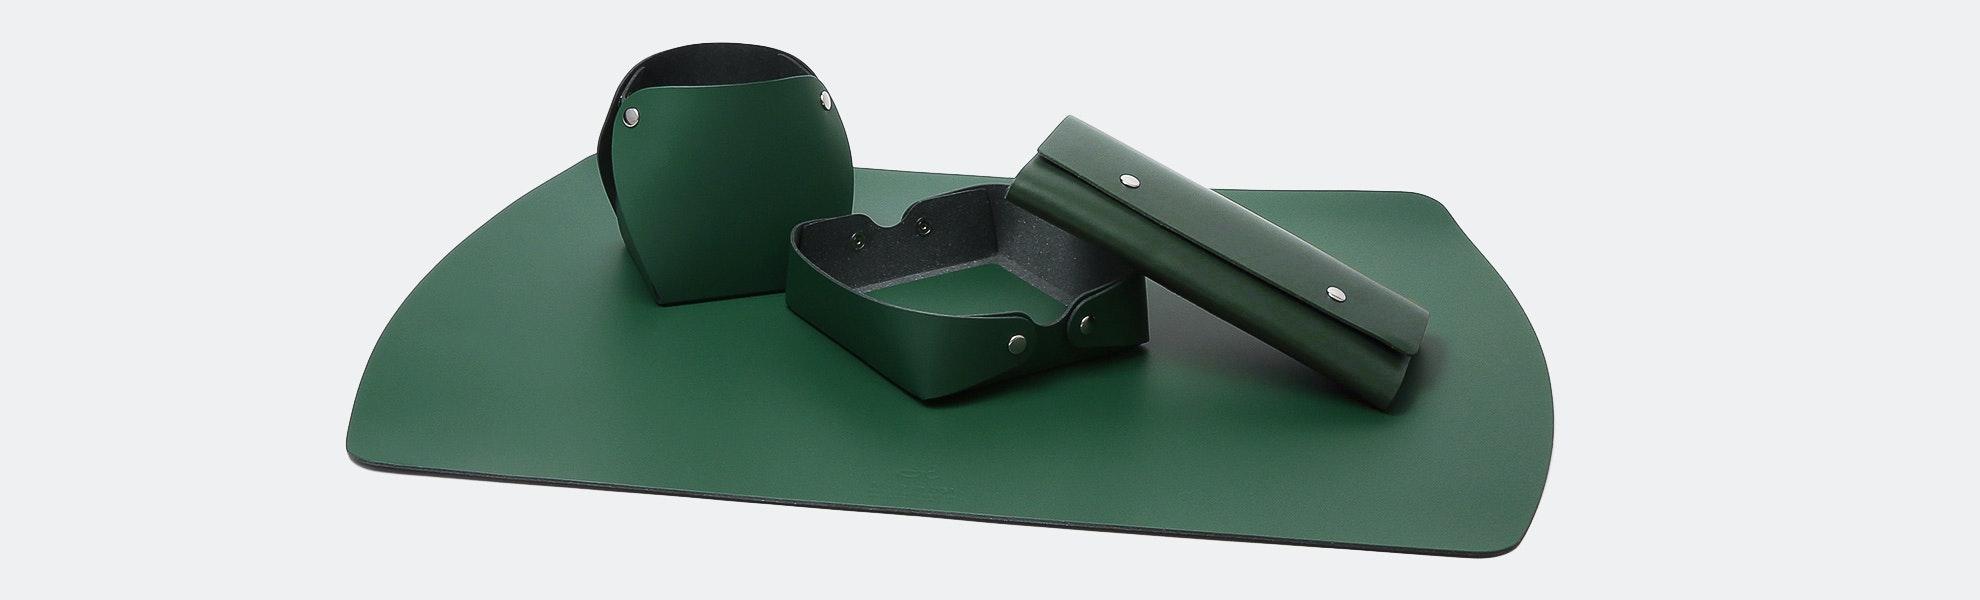 San Lorenzo Design Recycled Leather Desk Set